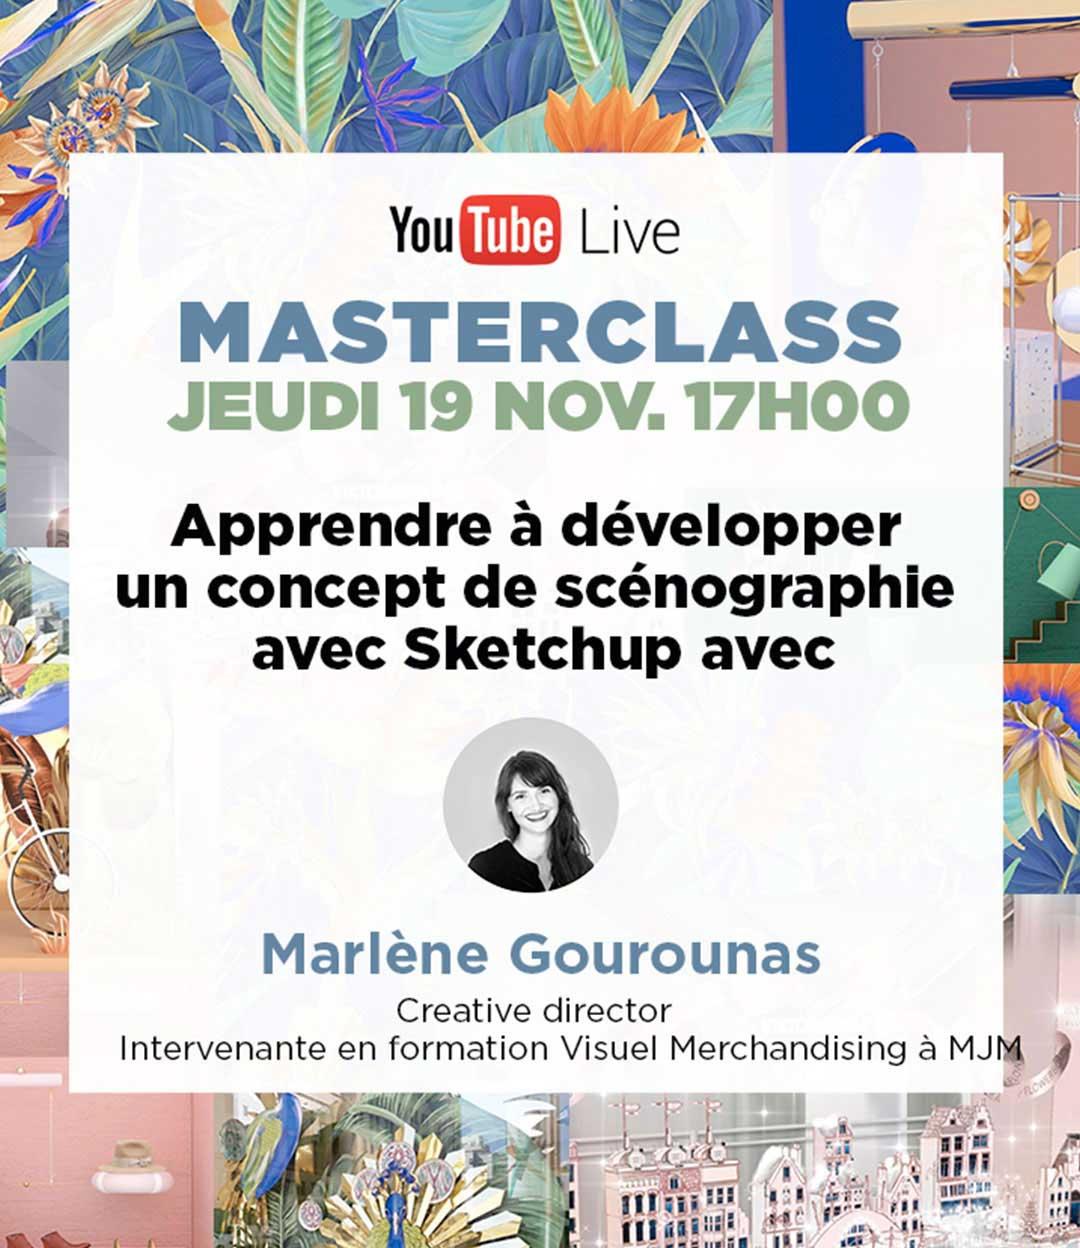 Masterclass Jeudi 19/11 Visual Marchandising